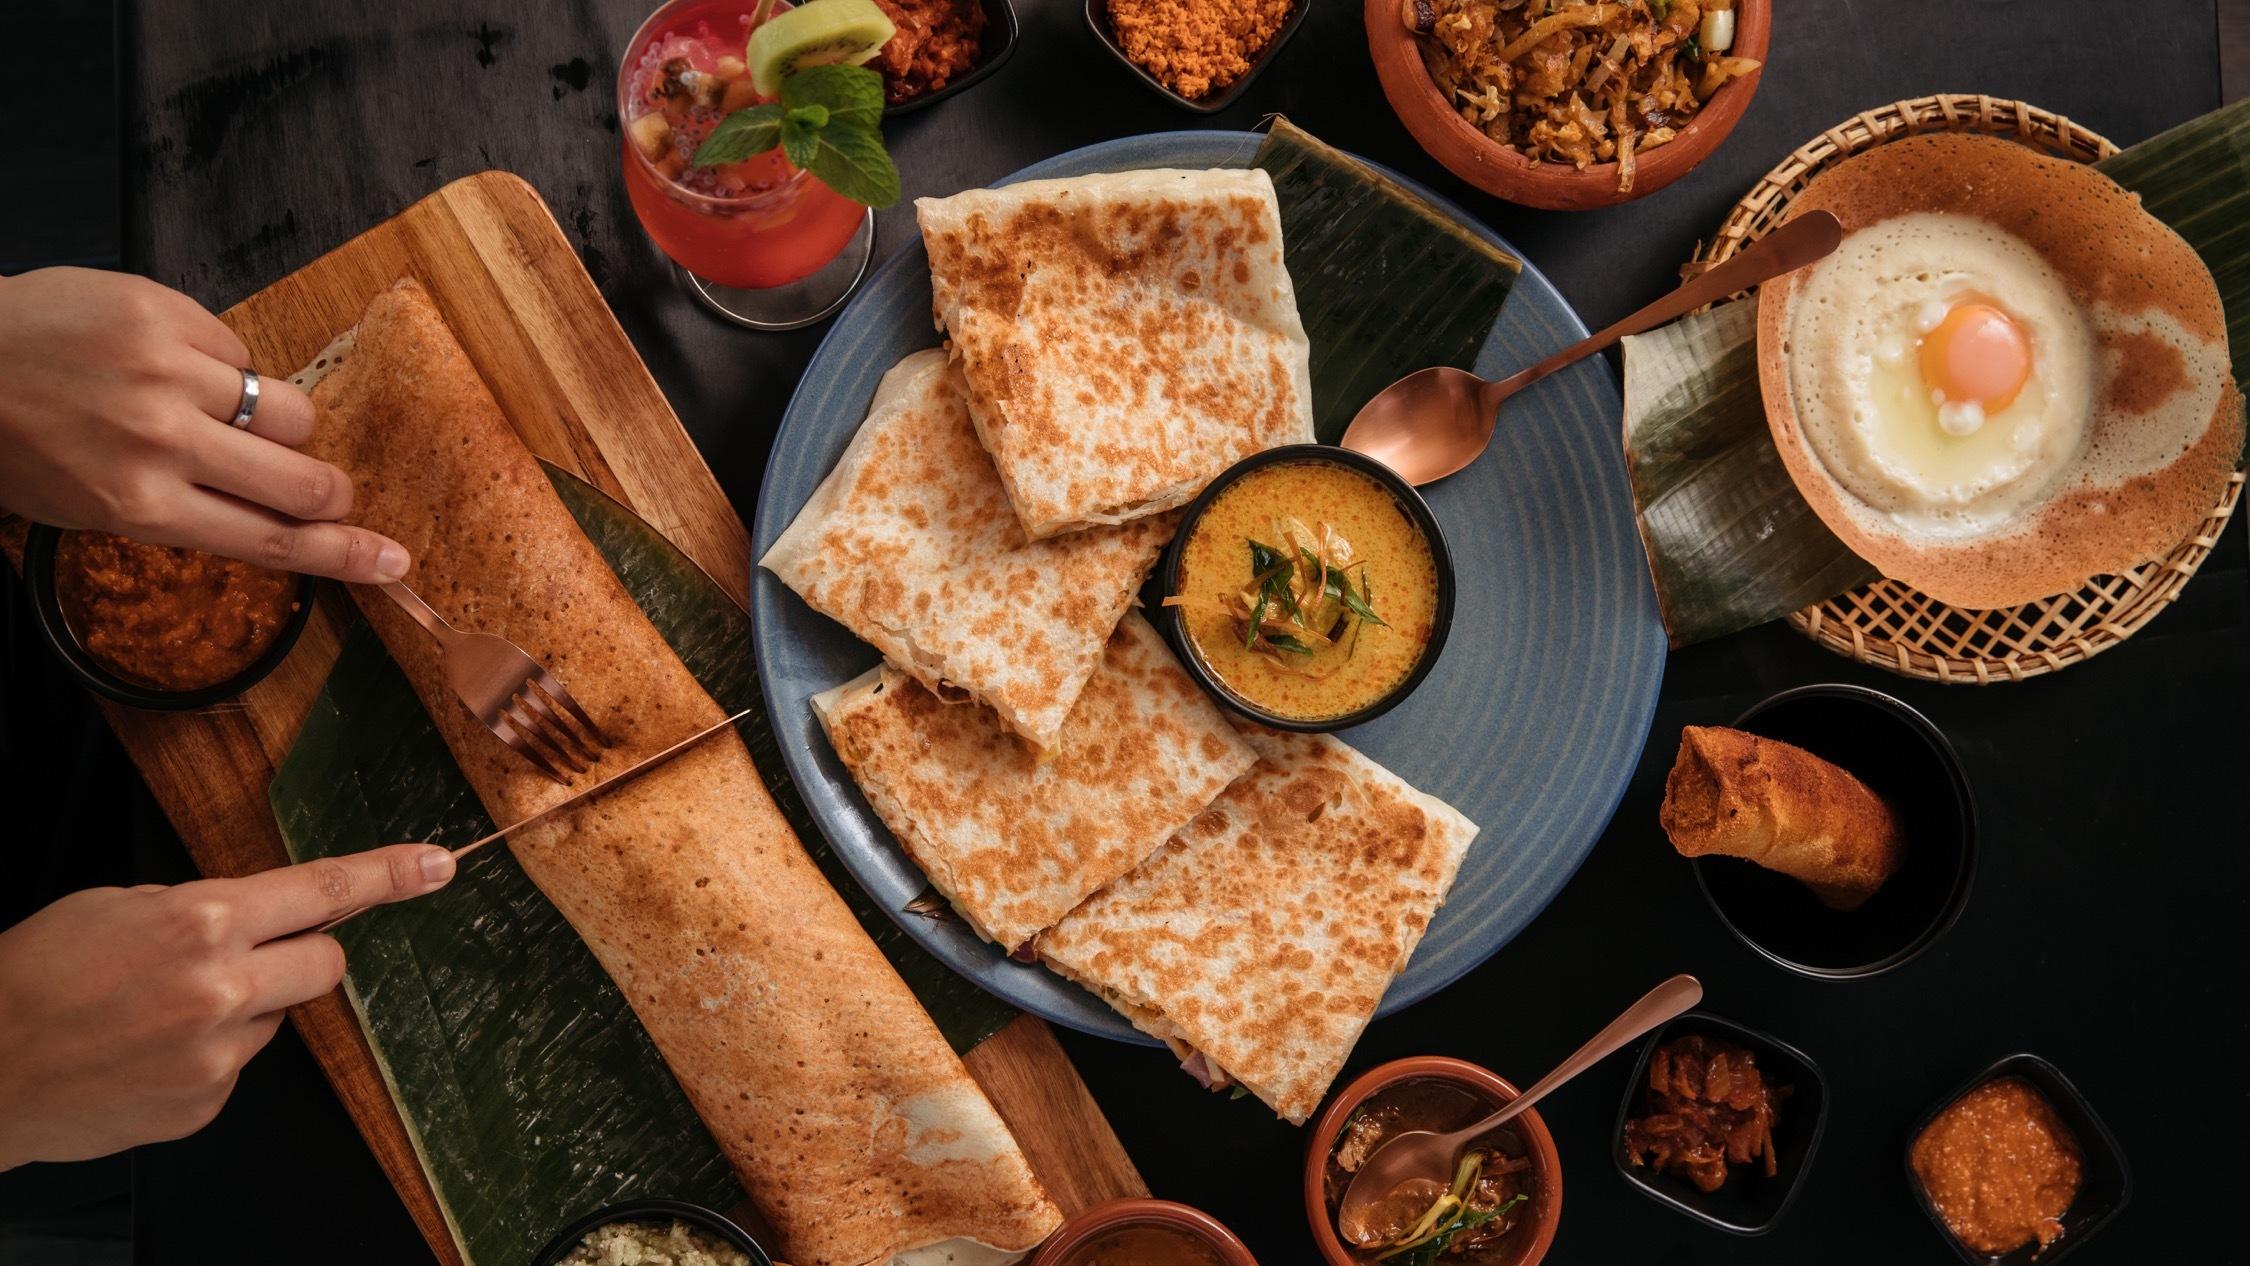 Table of food at Dish Sri Lankan Street Food